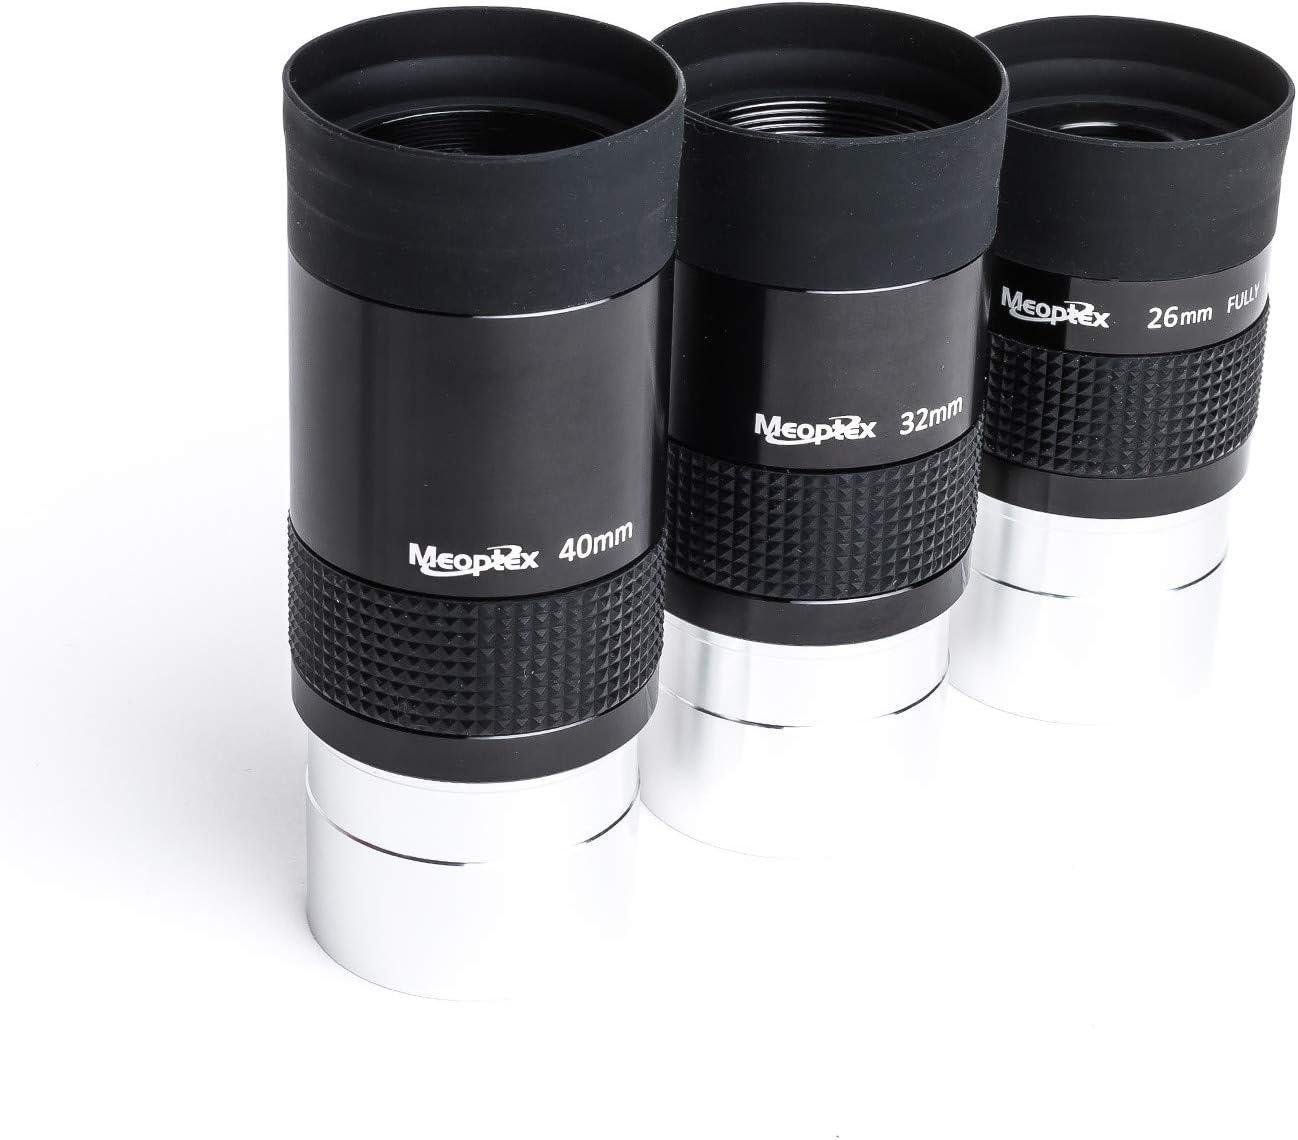 26mm MEOPTEX 2 Kellner 26mm 32mm 40mm Eyepiece for Telescope,FMC